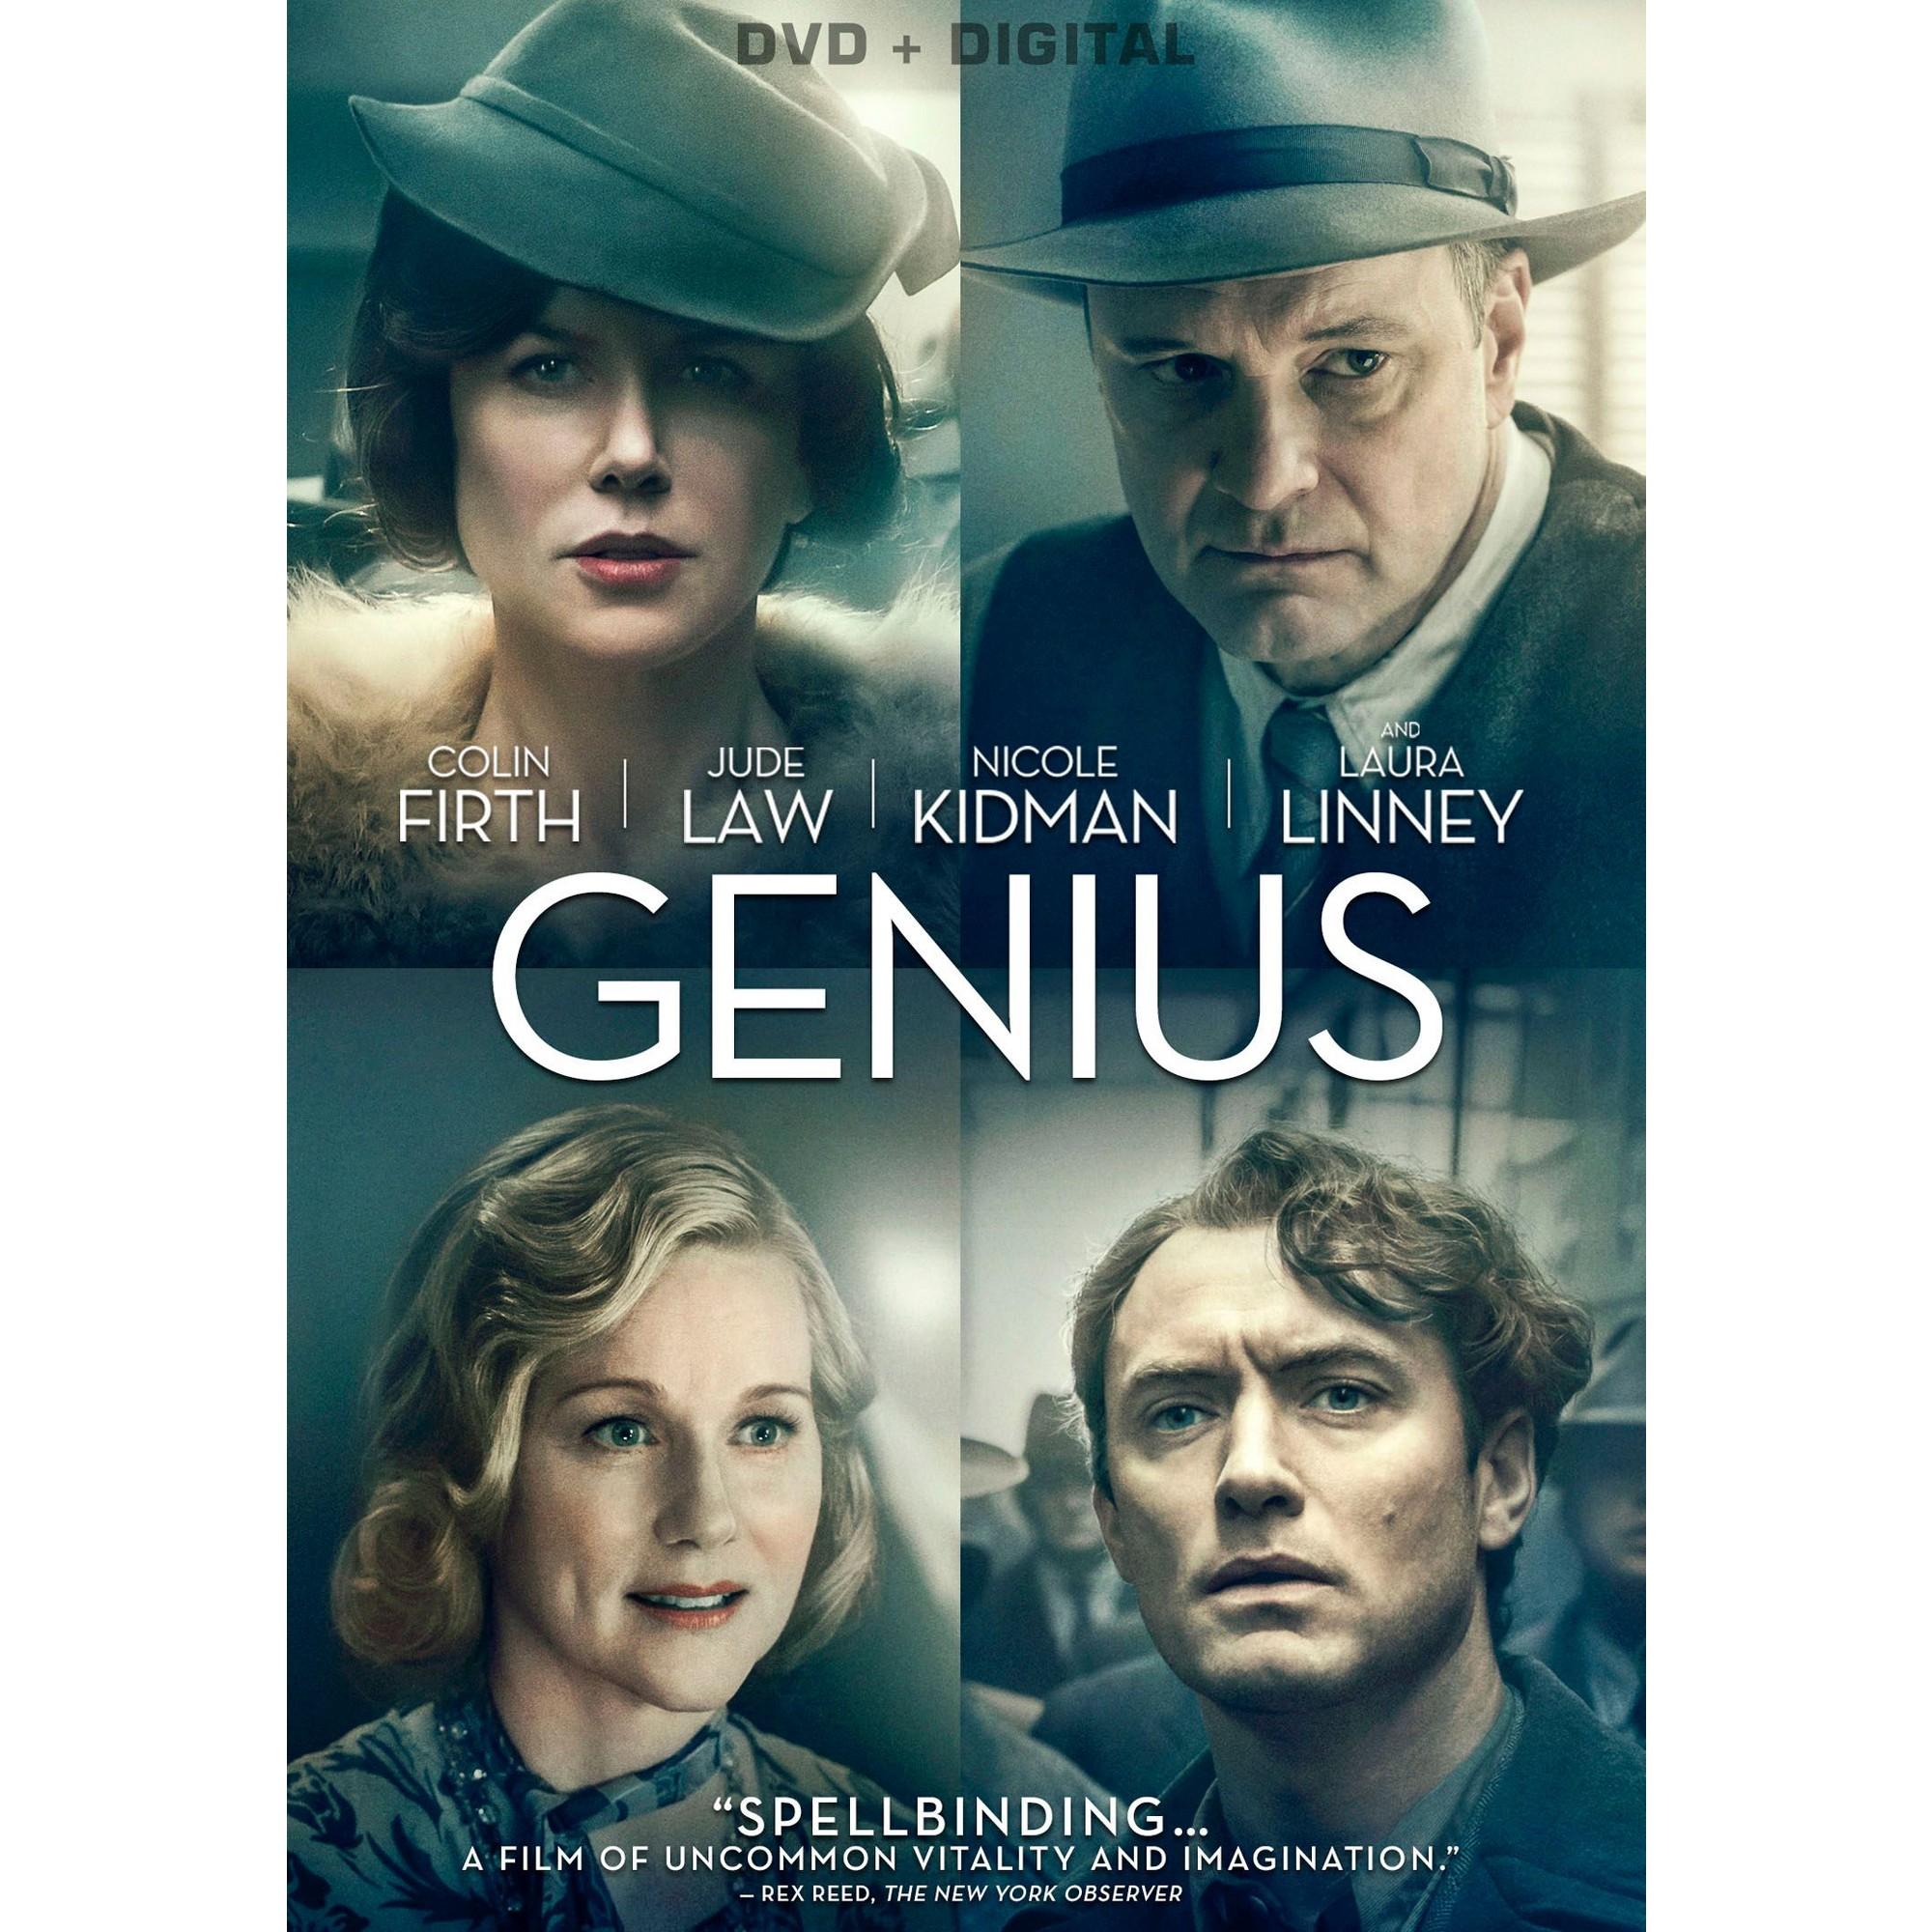 Genius Dvd 2016 In 2021 Movies Worth Watching Good Movies On Netflix Good Movies To Watch